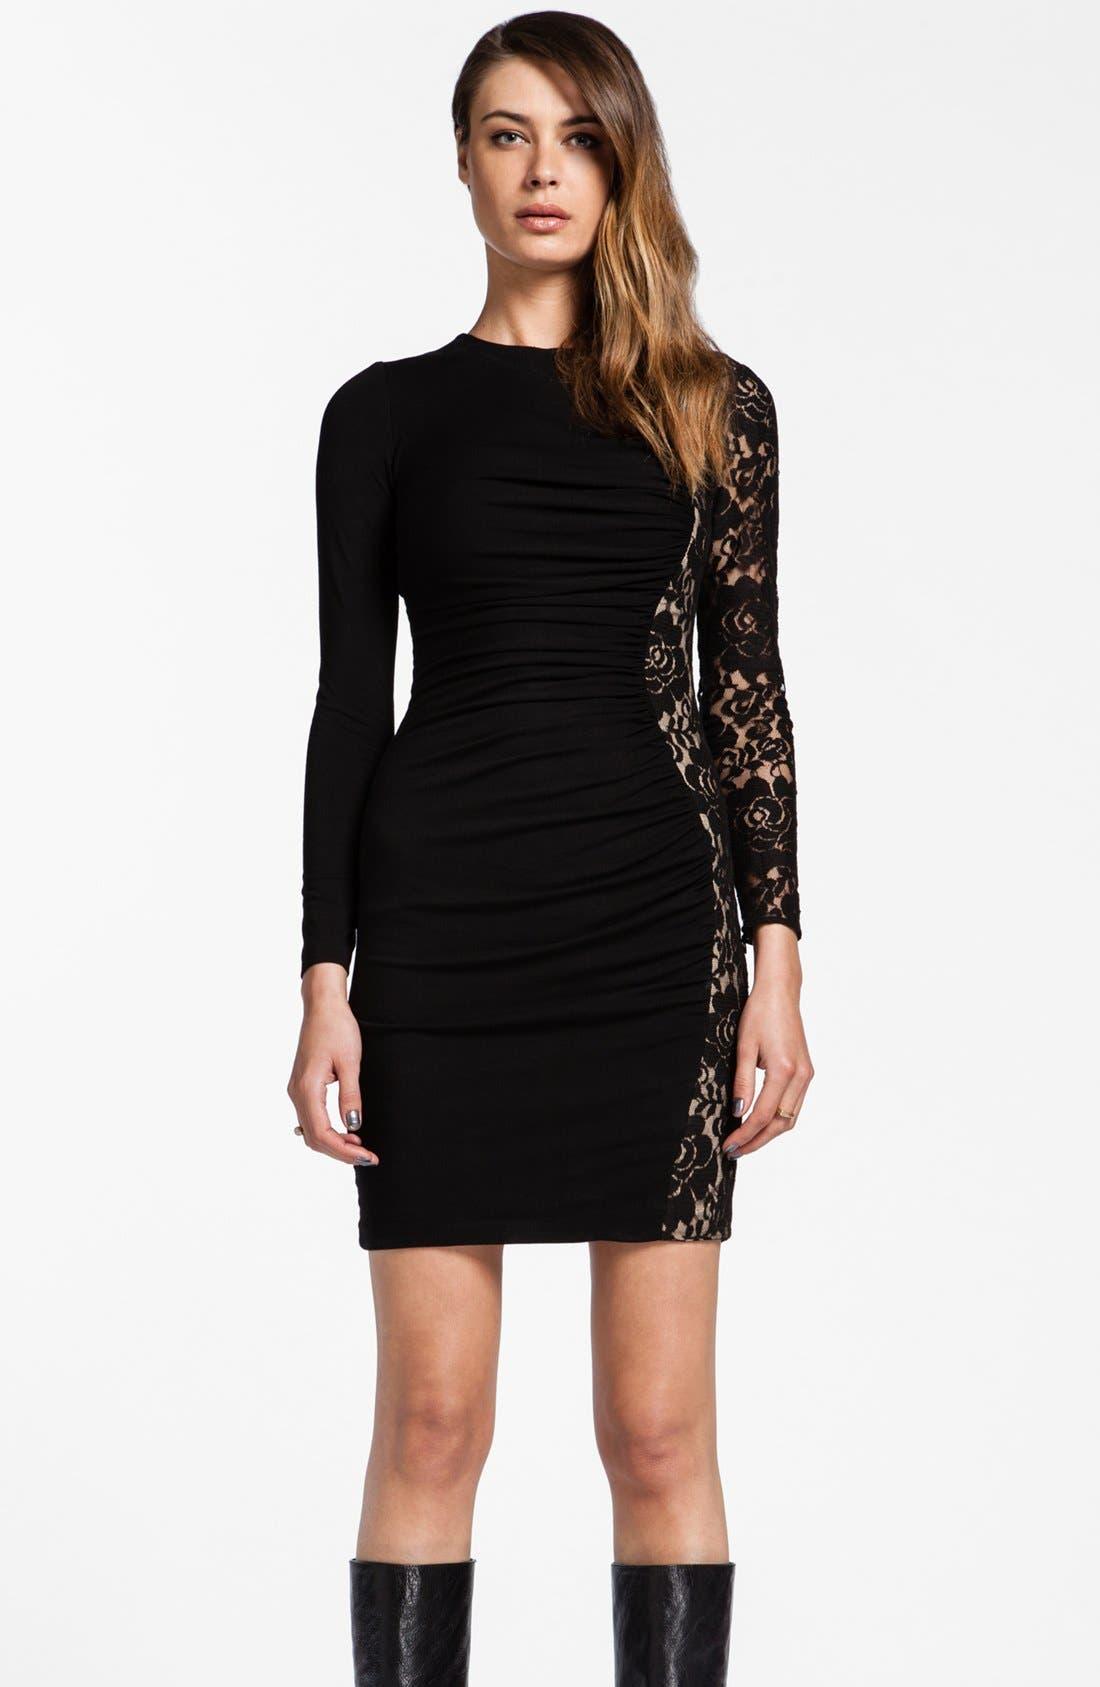 Alternate Image 1 Selected - Cynthia Steffe 'Jordana' Asymmetrical Lace Ruched Sheath Dress